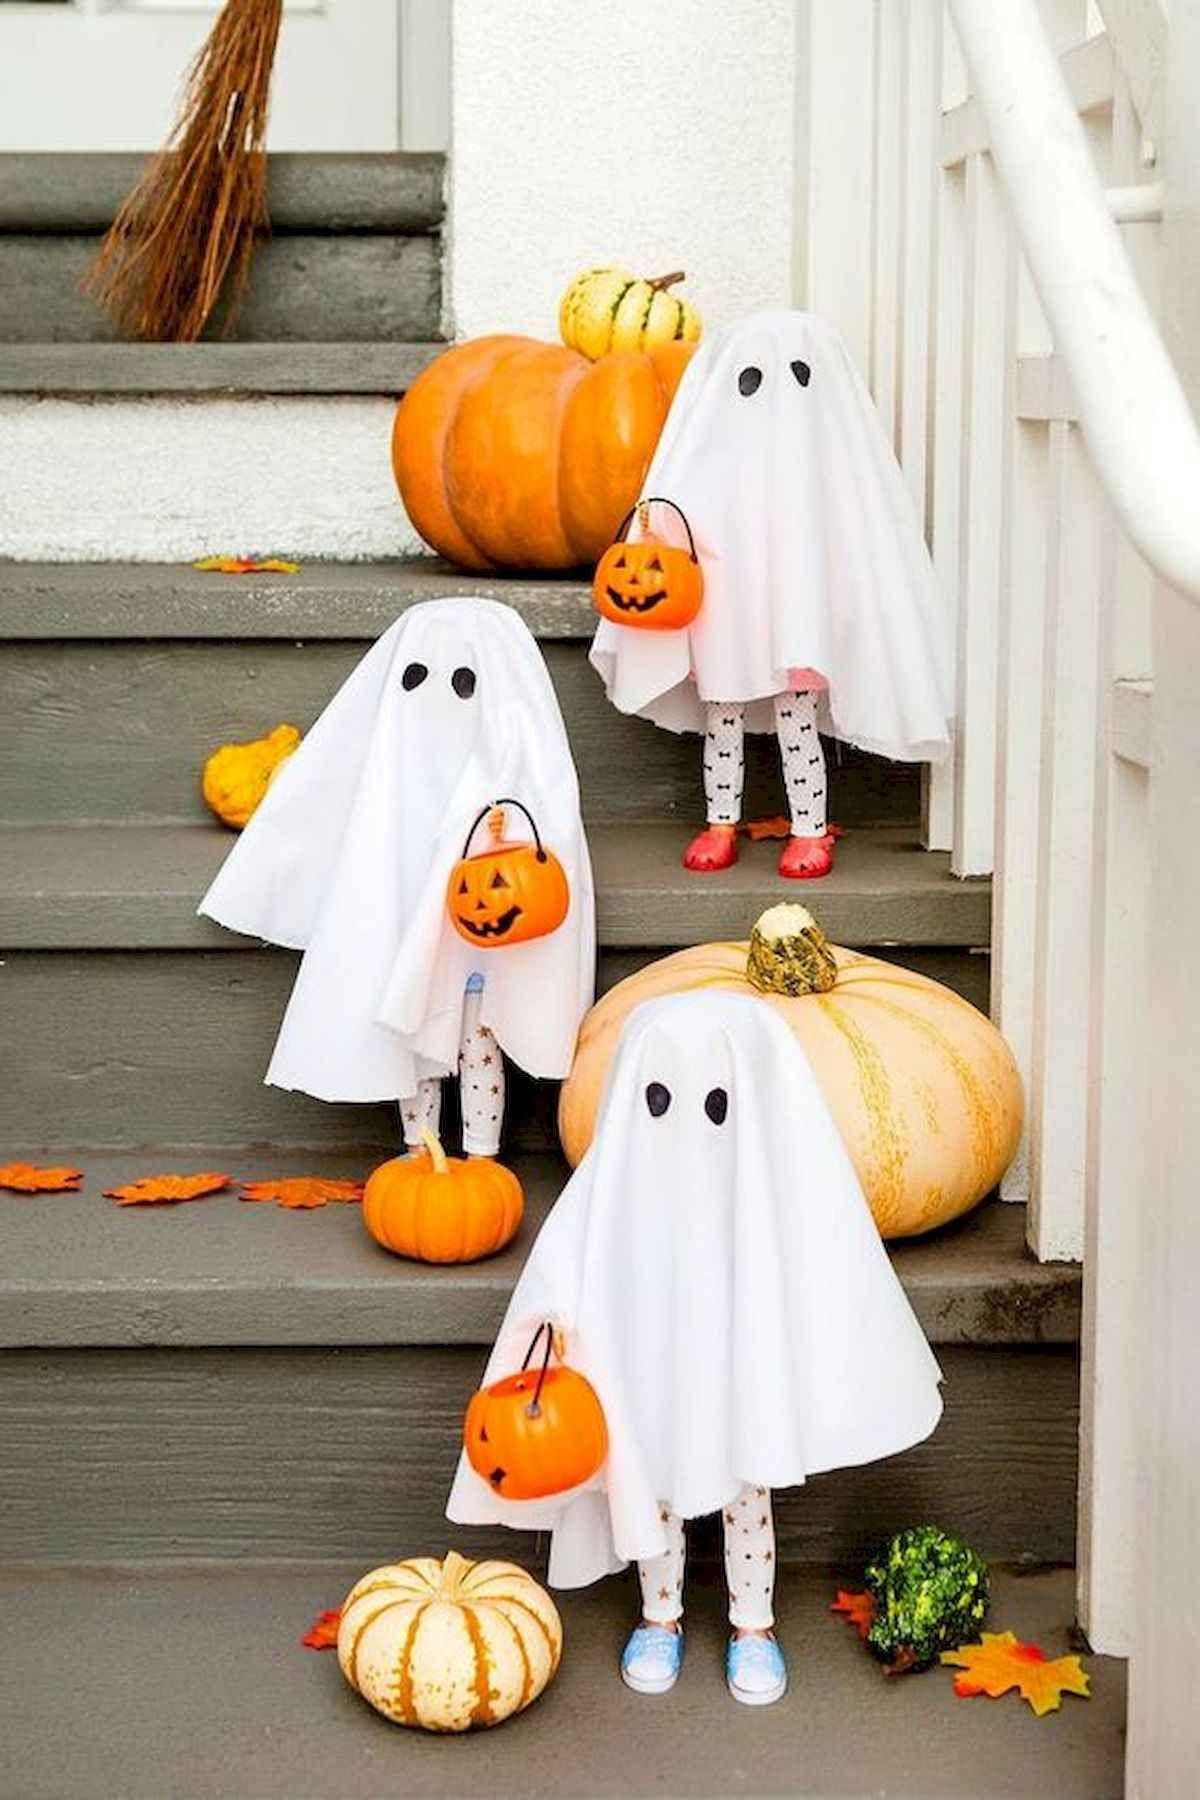 90 Awesome Diy Halloween Decorations Ideas Diy Home Decor Diy